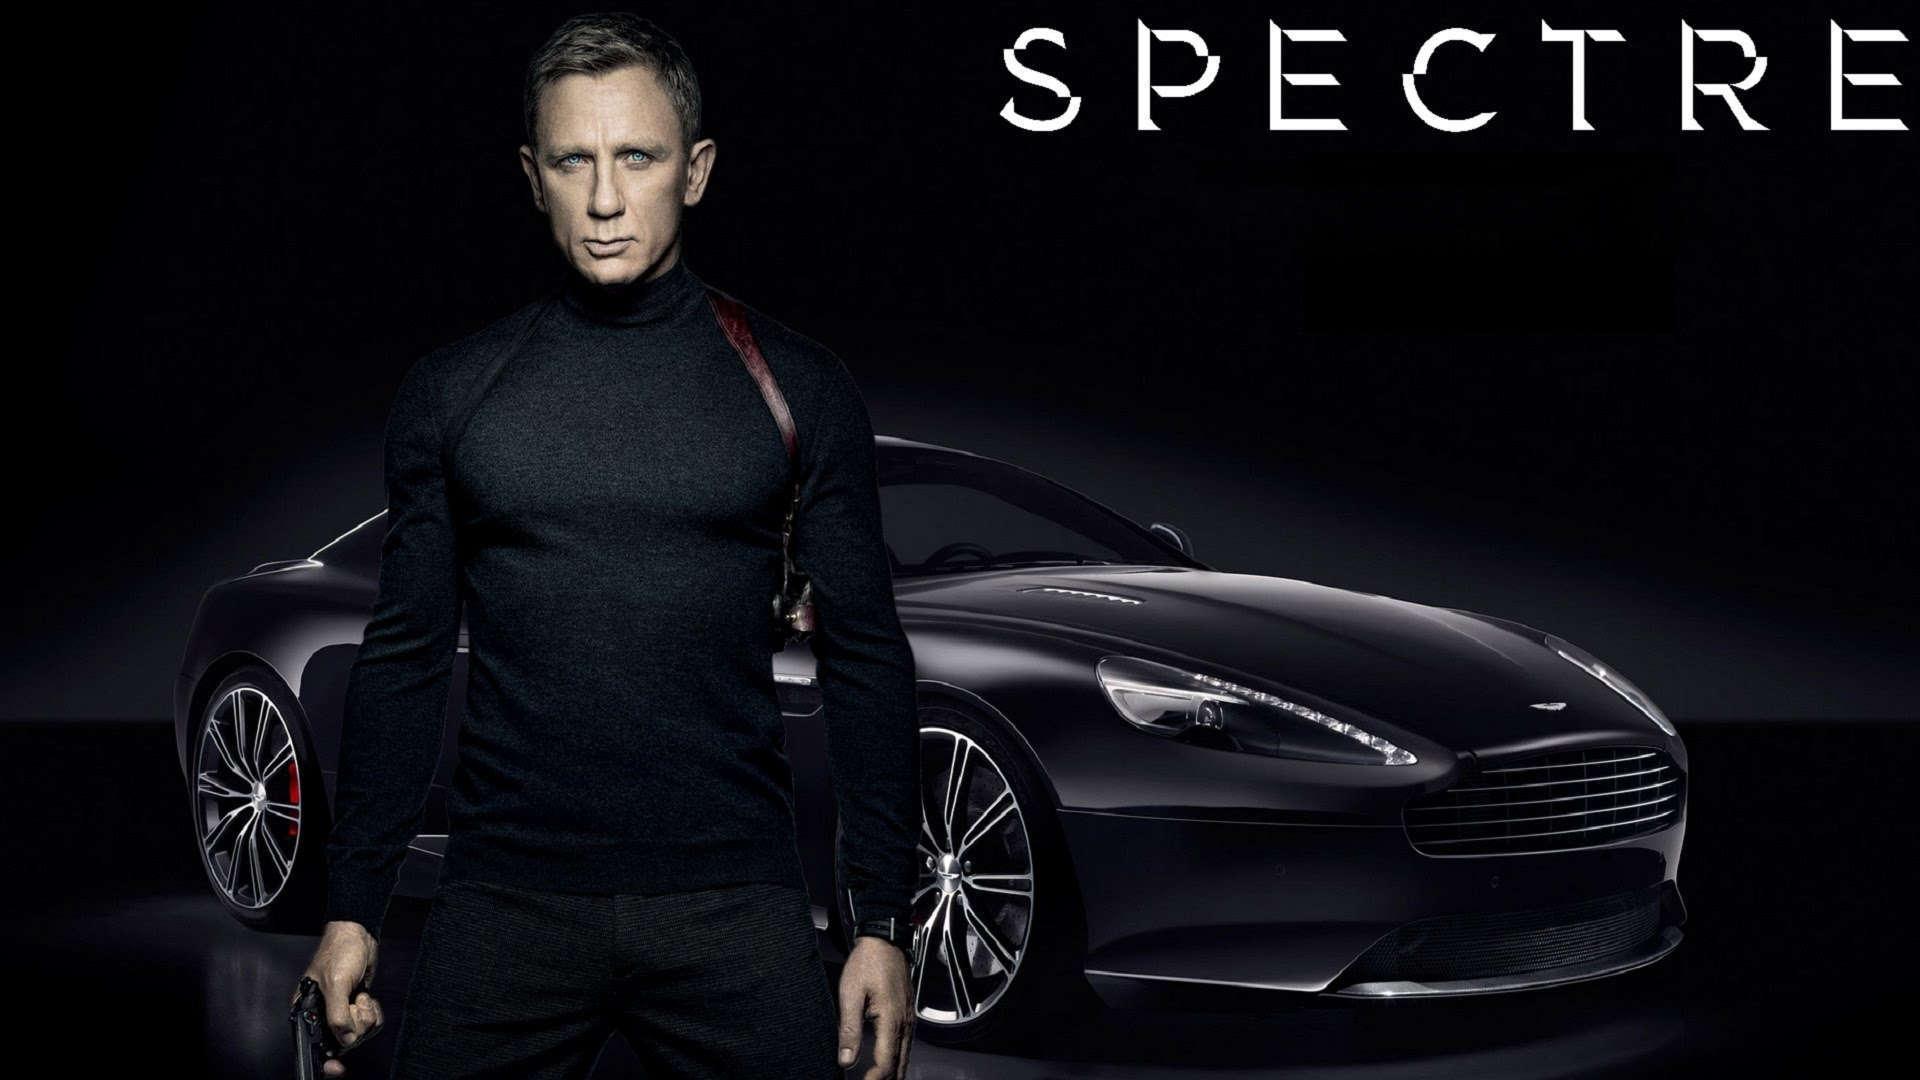 Wallpaper James Bond Wallpaper Spectre 1080p Upload at December 1 1920x1080